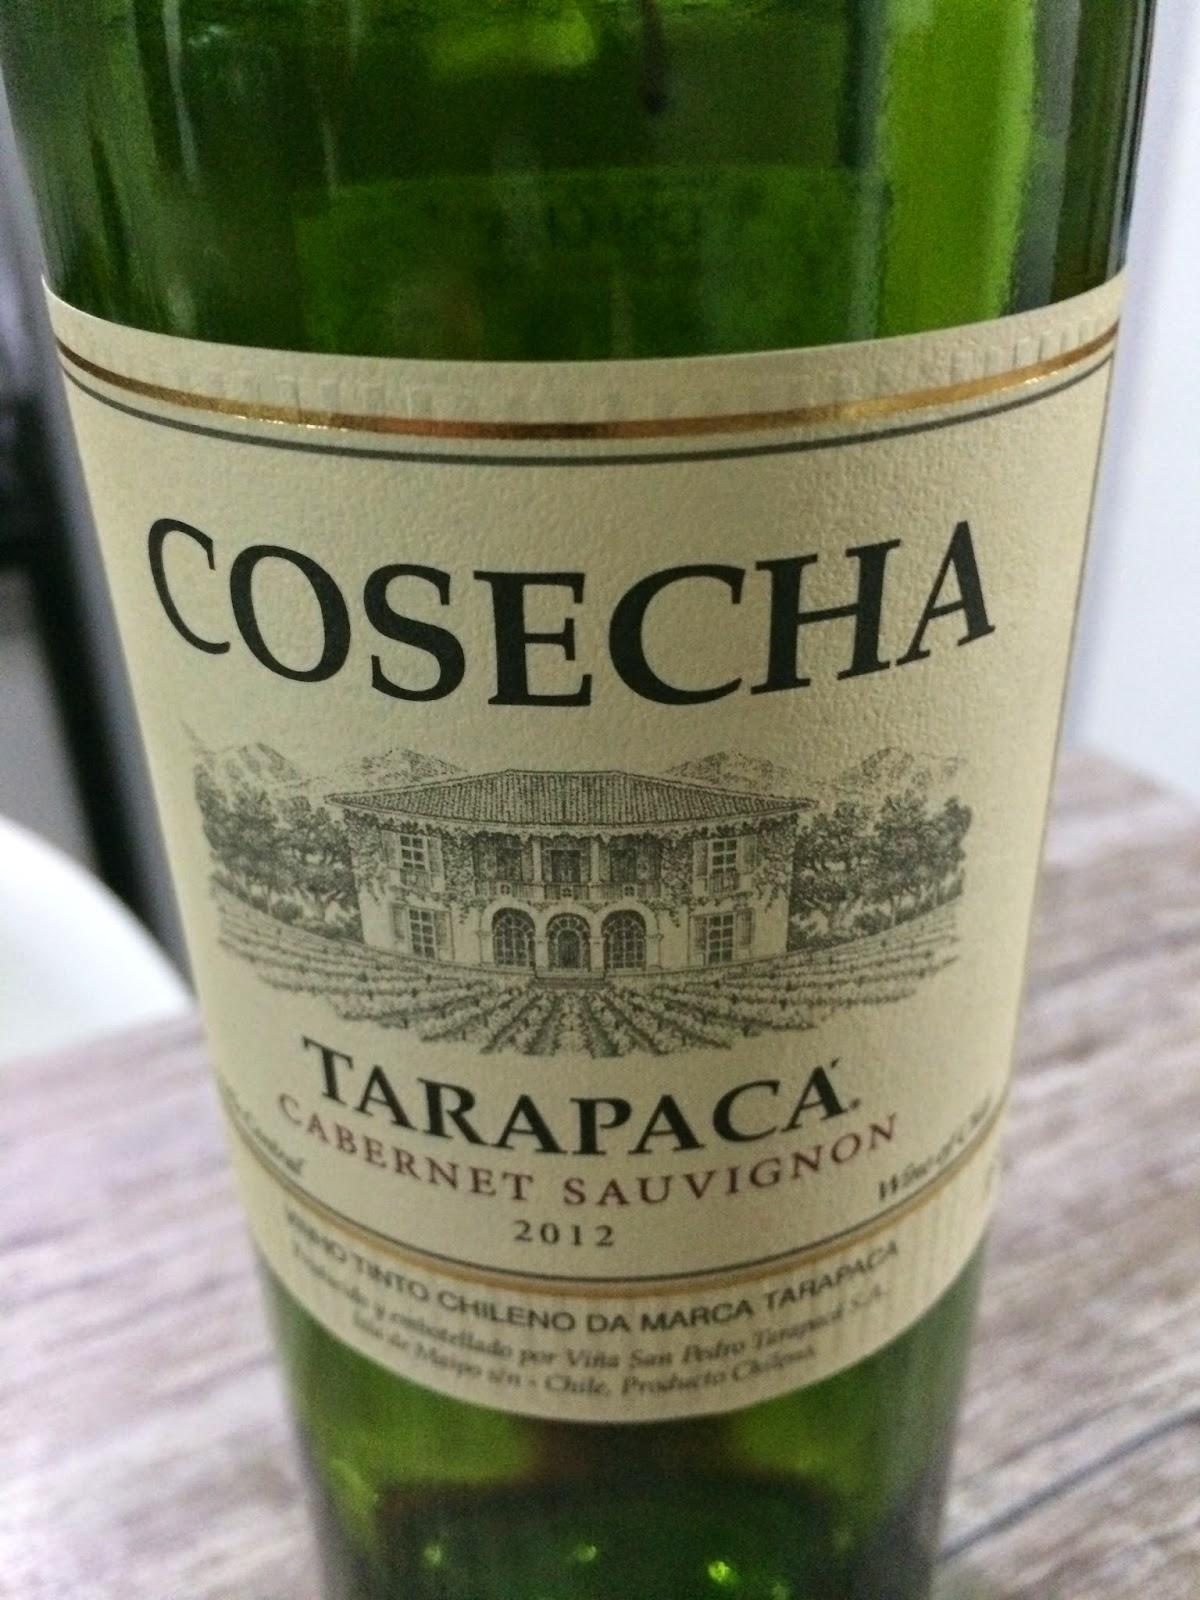 vinho, tinto, Cosecha, Cabernet Sauvignon, Tarapacá, chileno